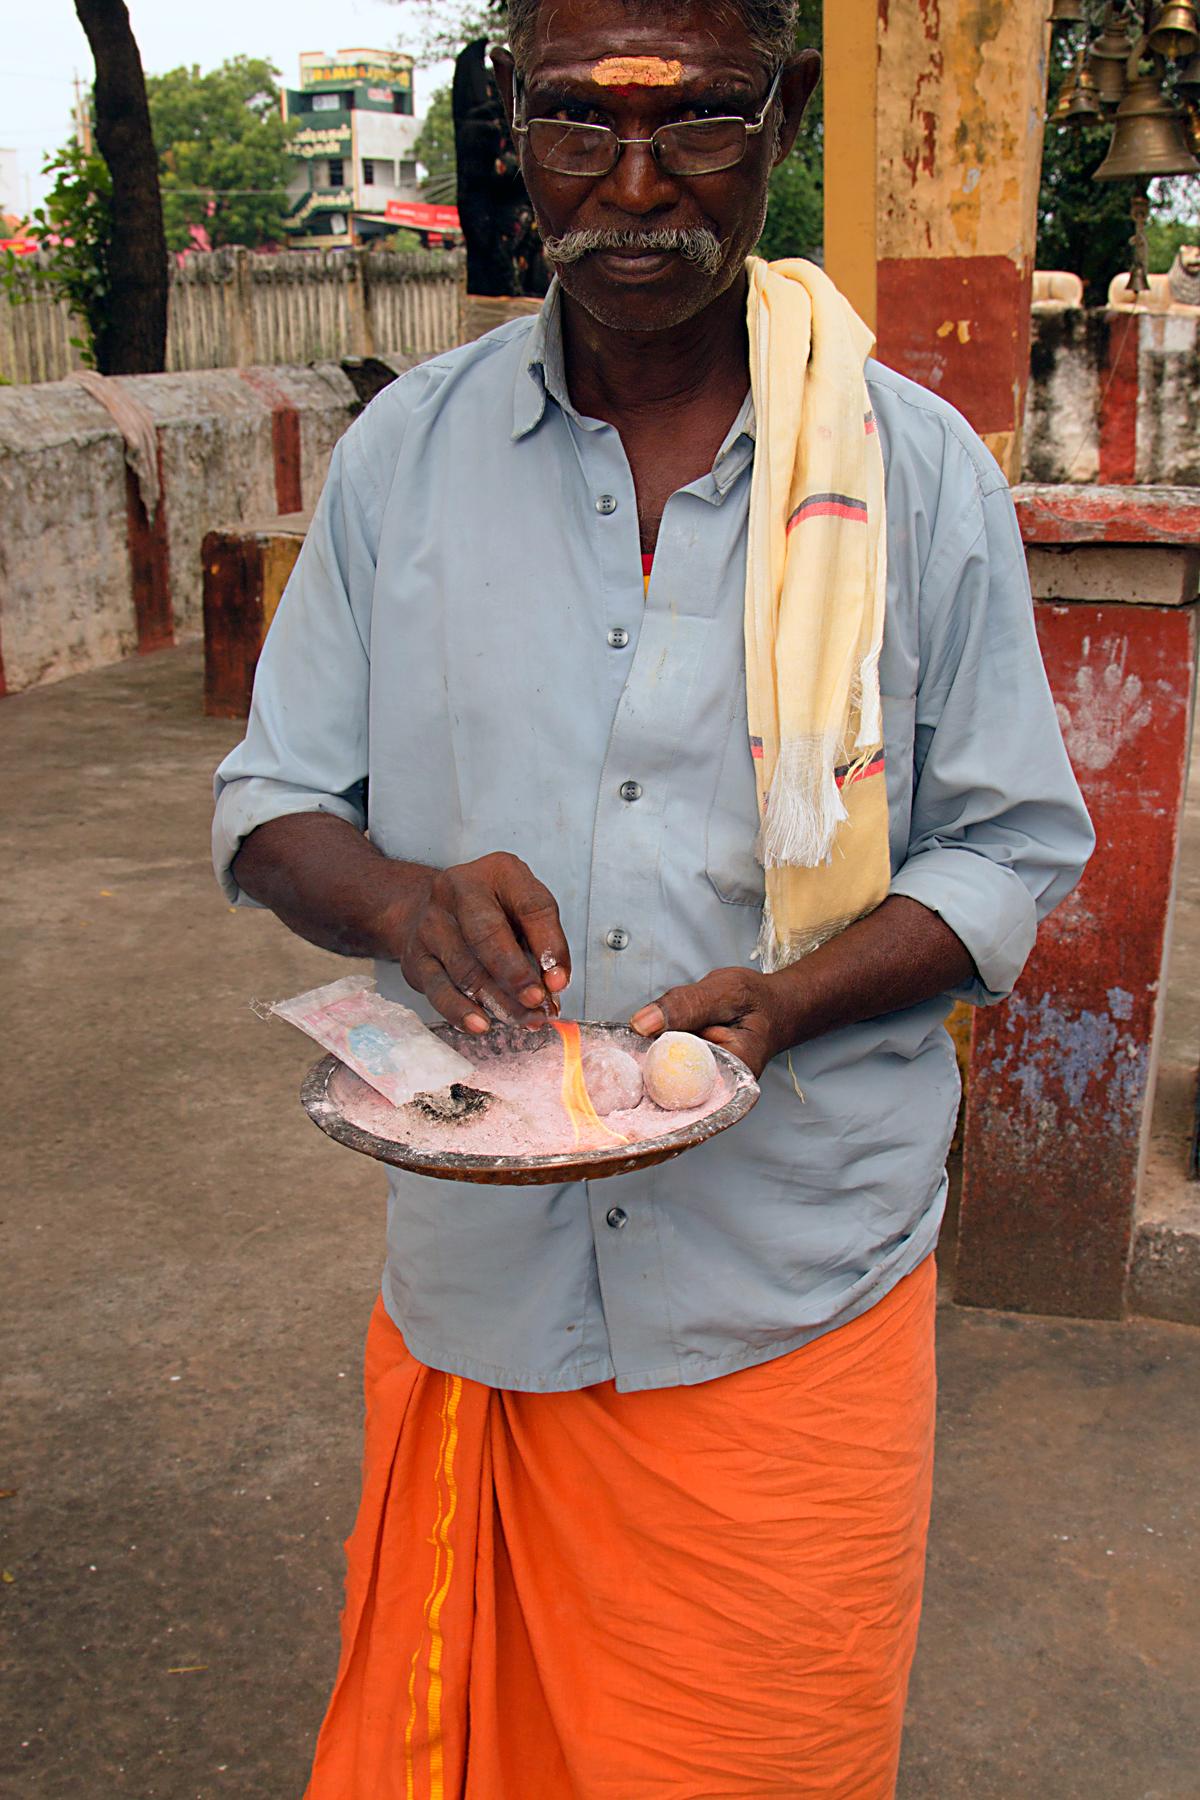 INDIEN Kumily Thekkady Kumarakom Kerala Menschen Tempel FINEST-onTour 7875.jpg